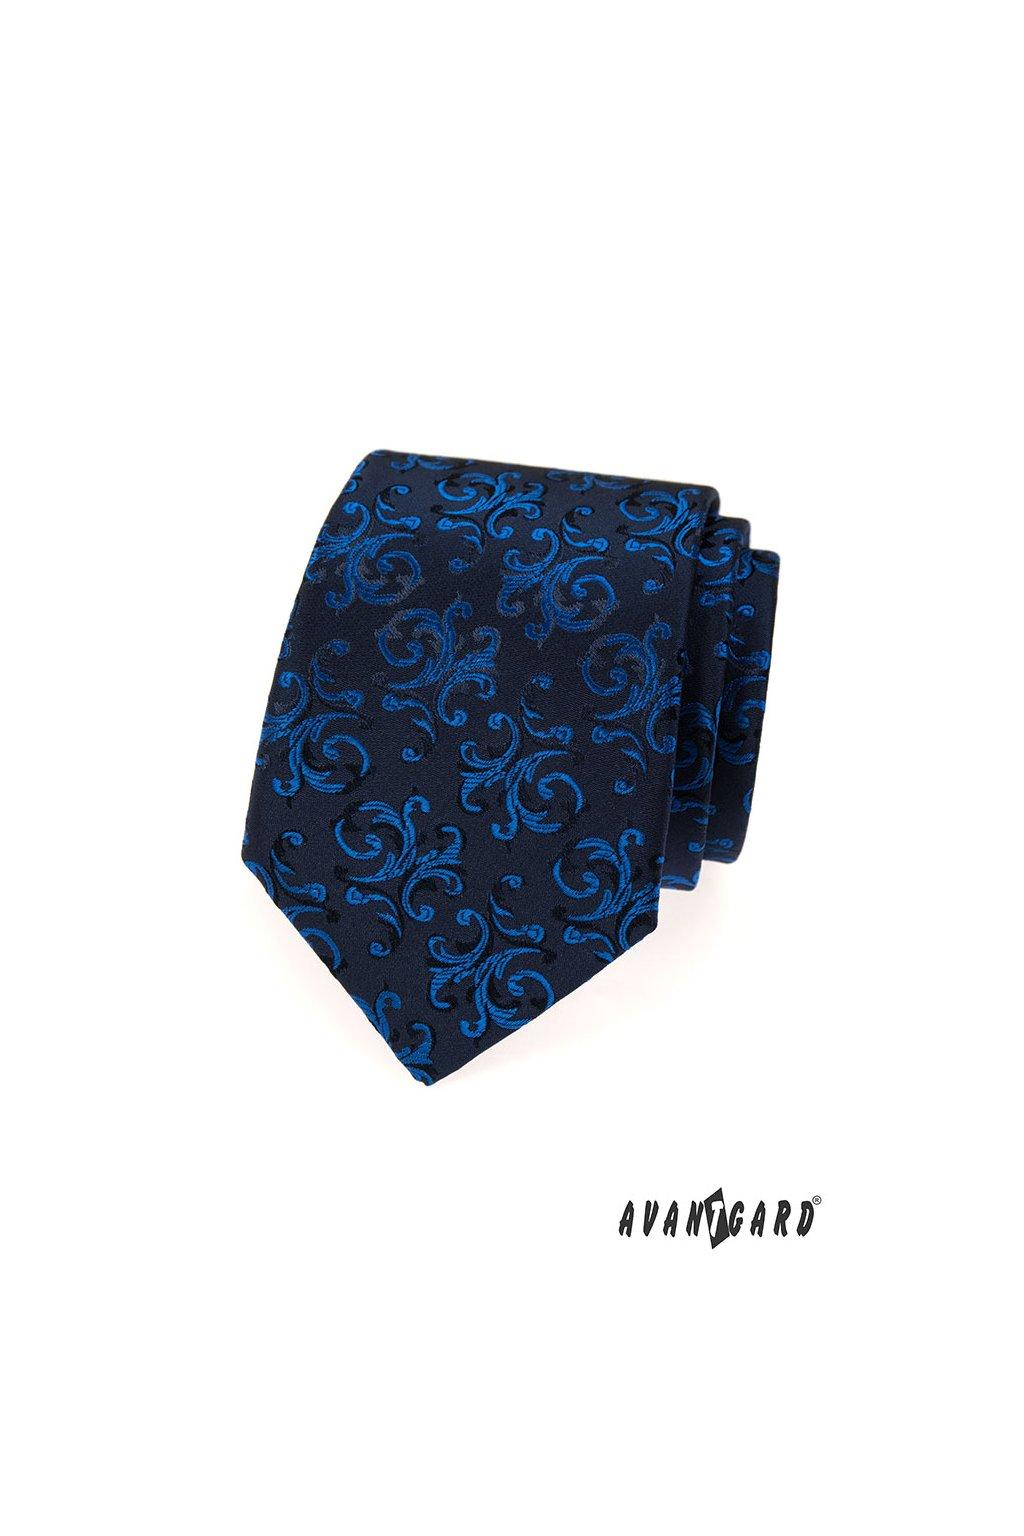 Tmavě modrá kravata s modrým zdobeným vzorem